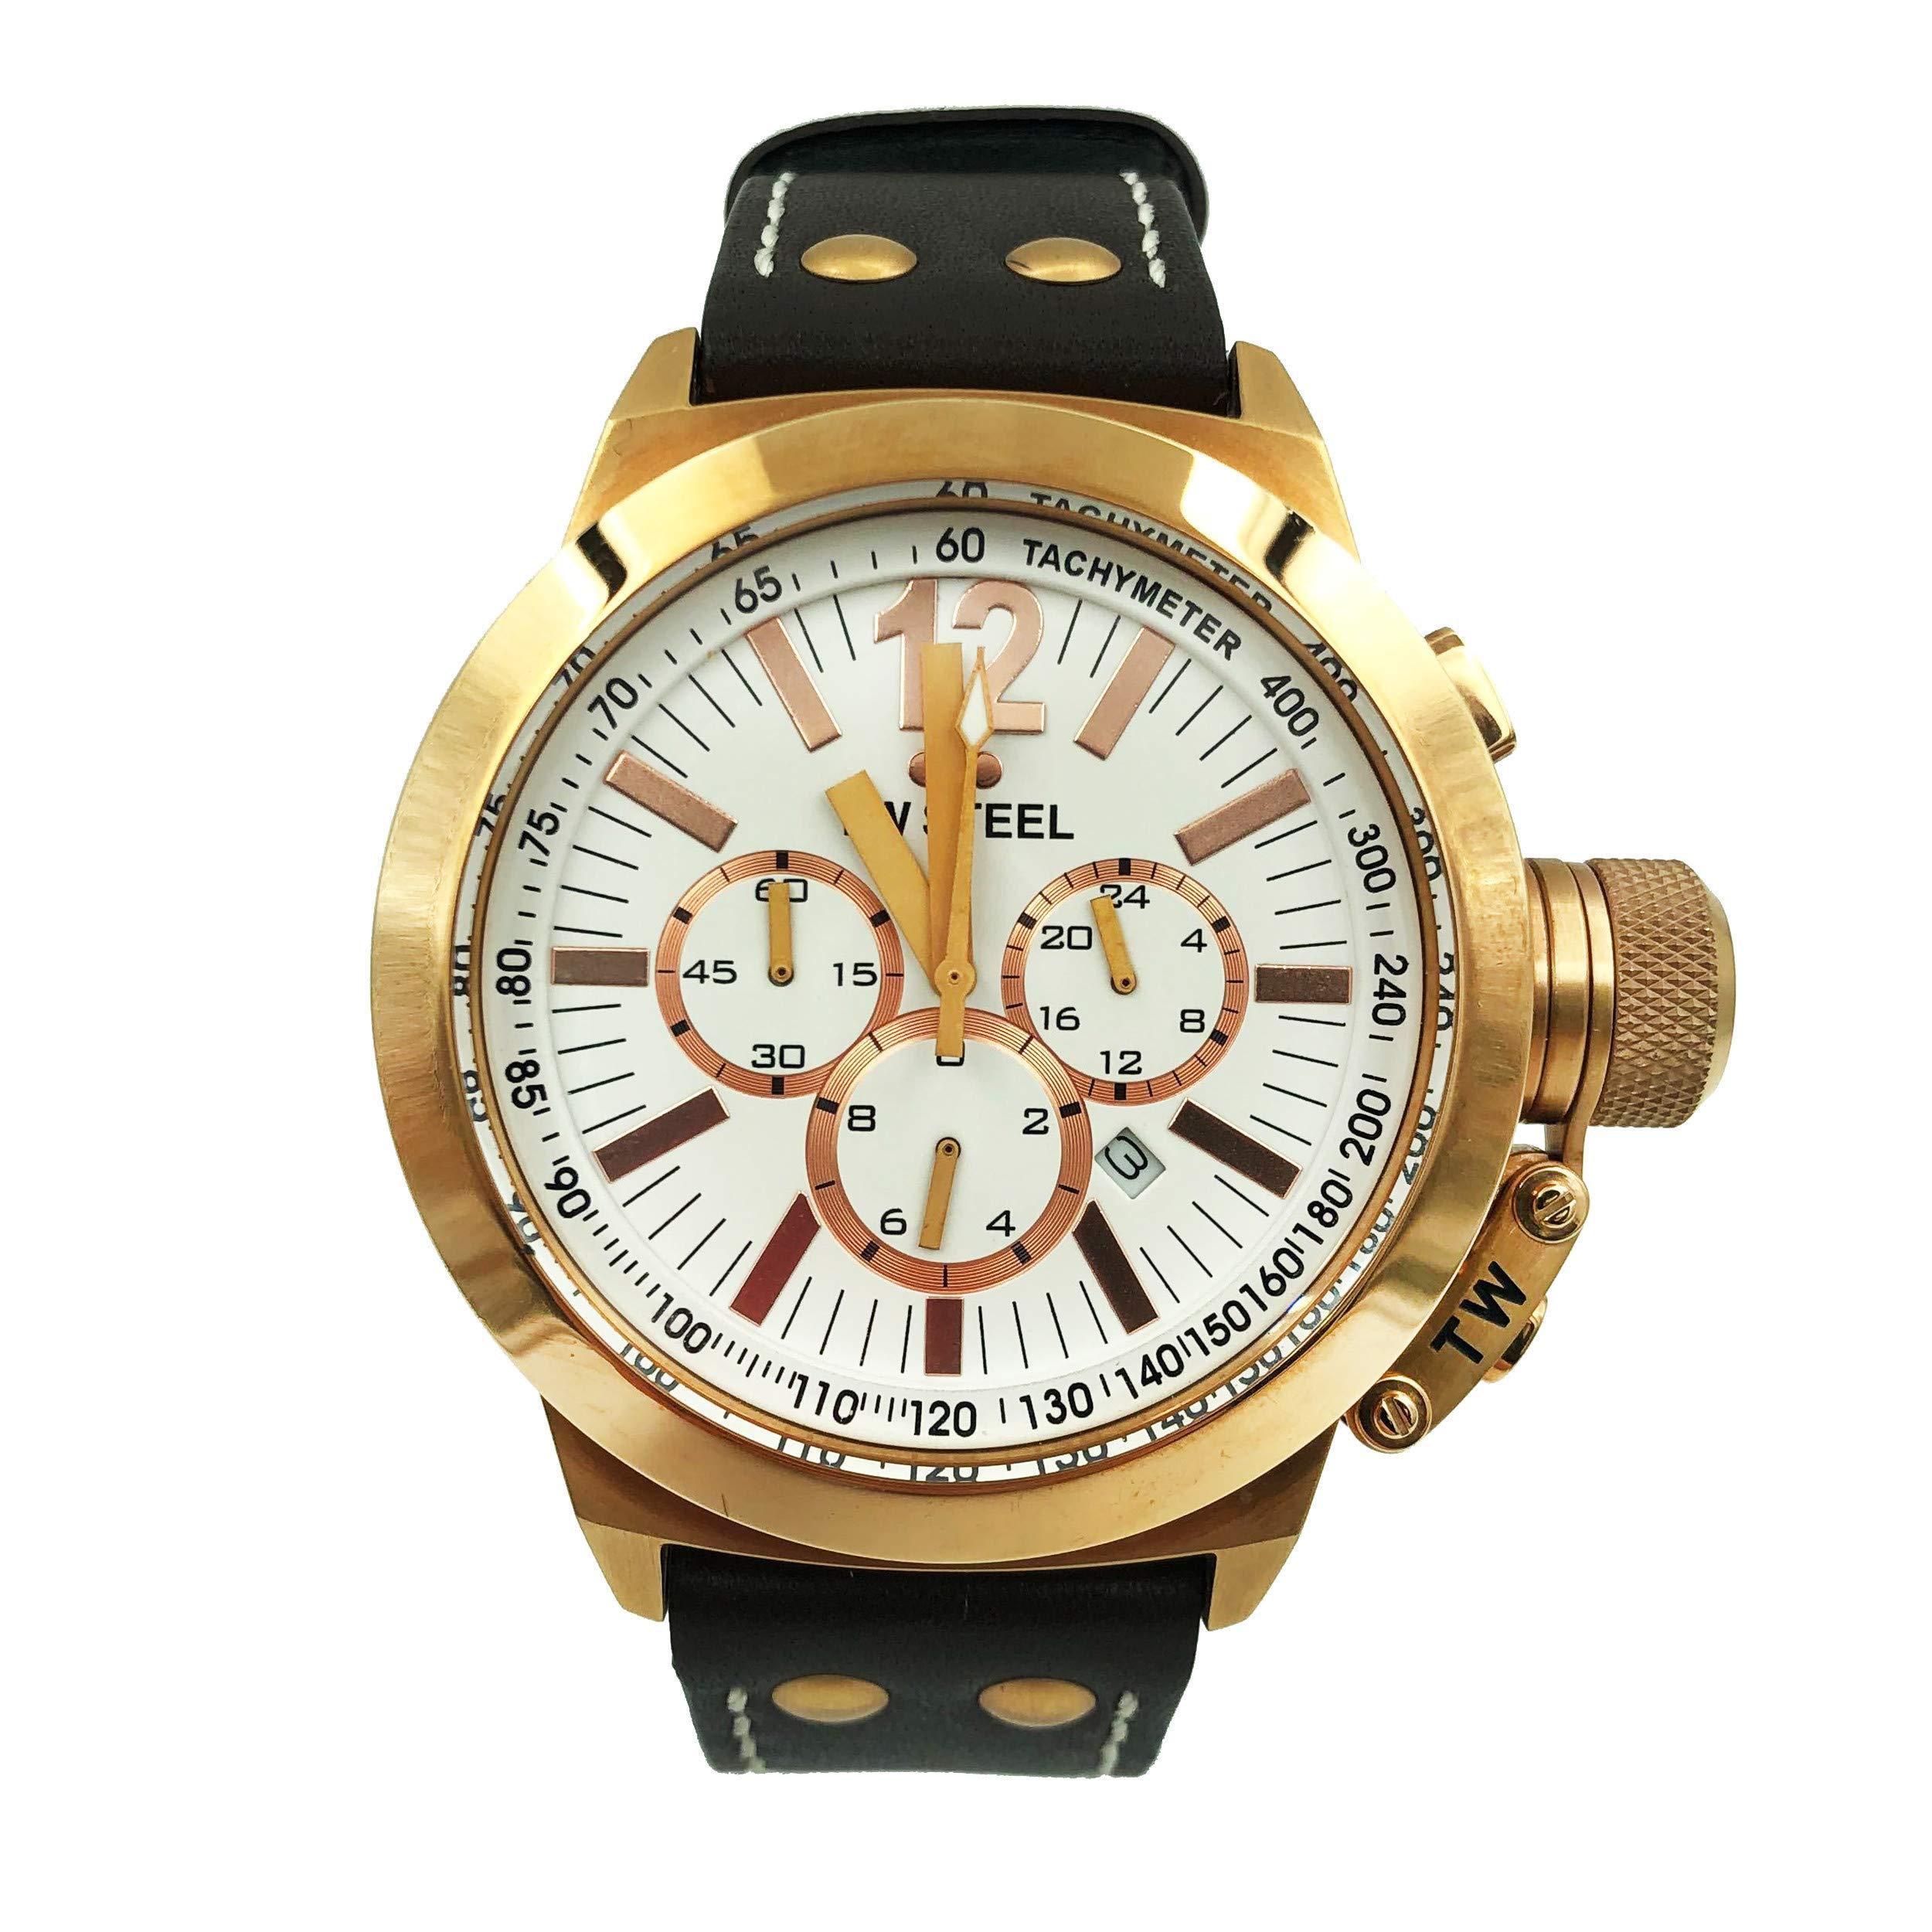 TW Steel CEO Quartz Male Watch CE1019 (Certified Pre-Owned)